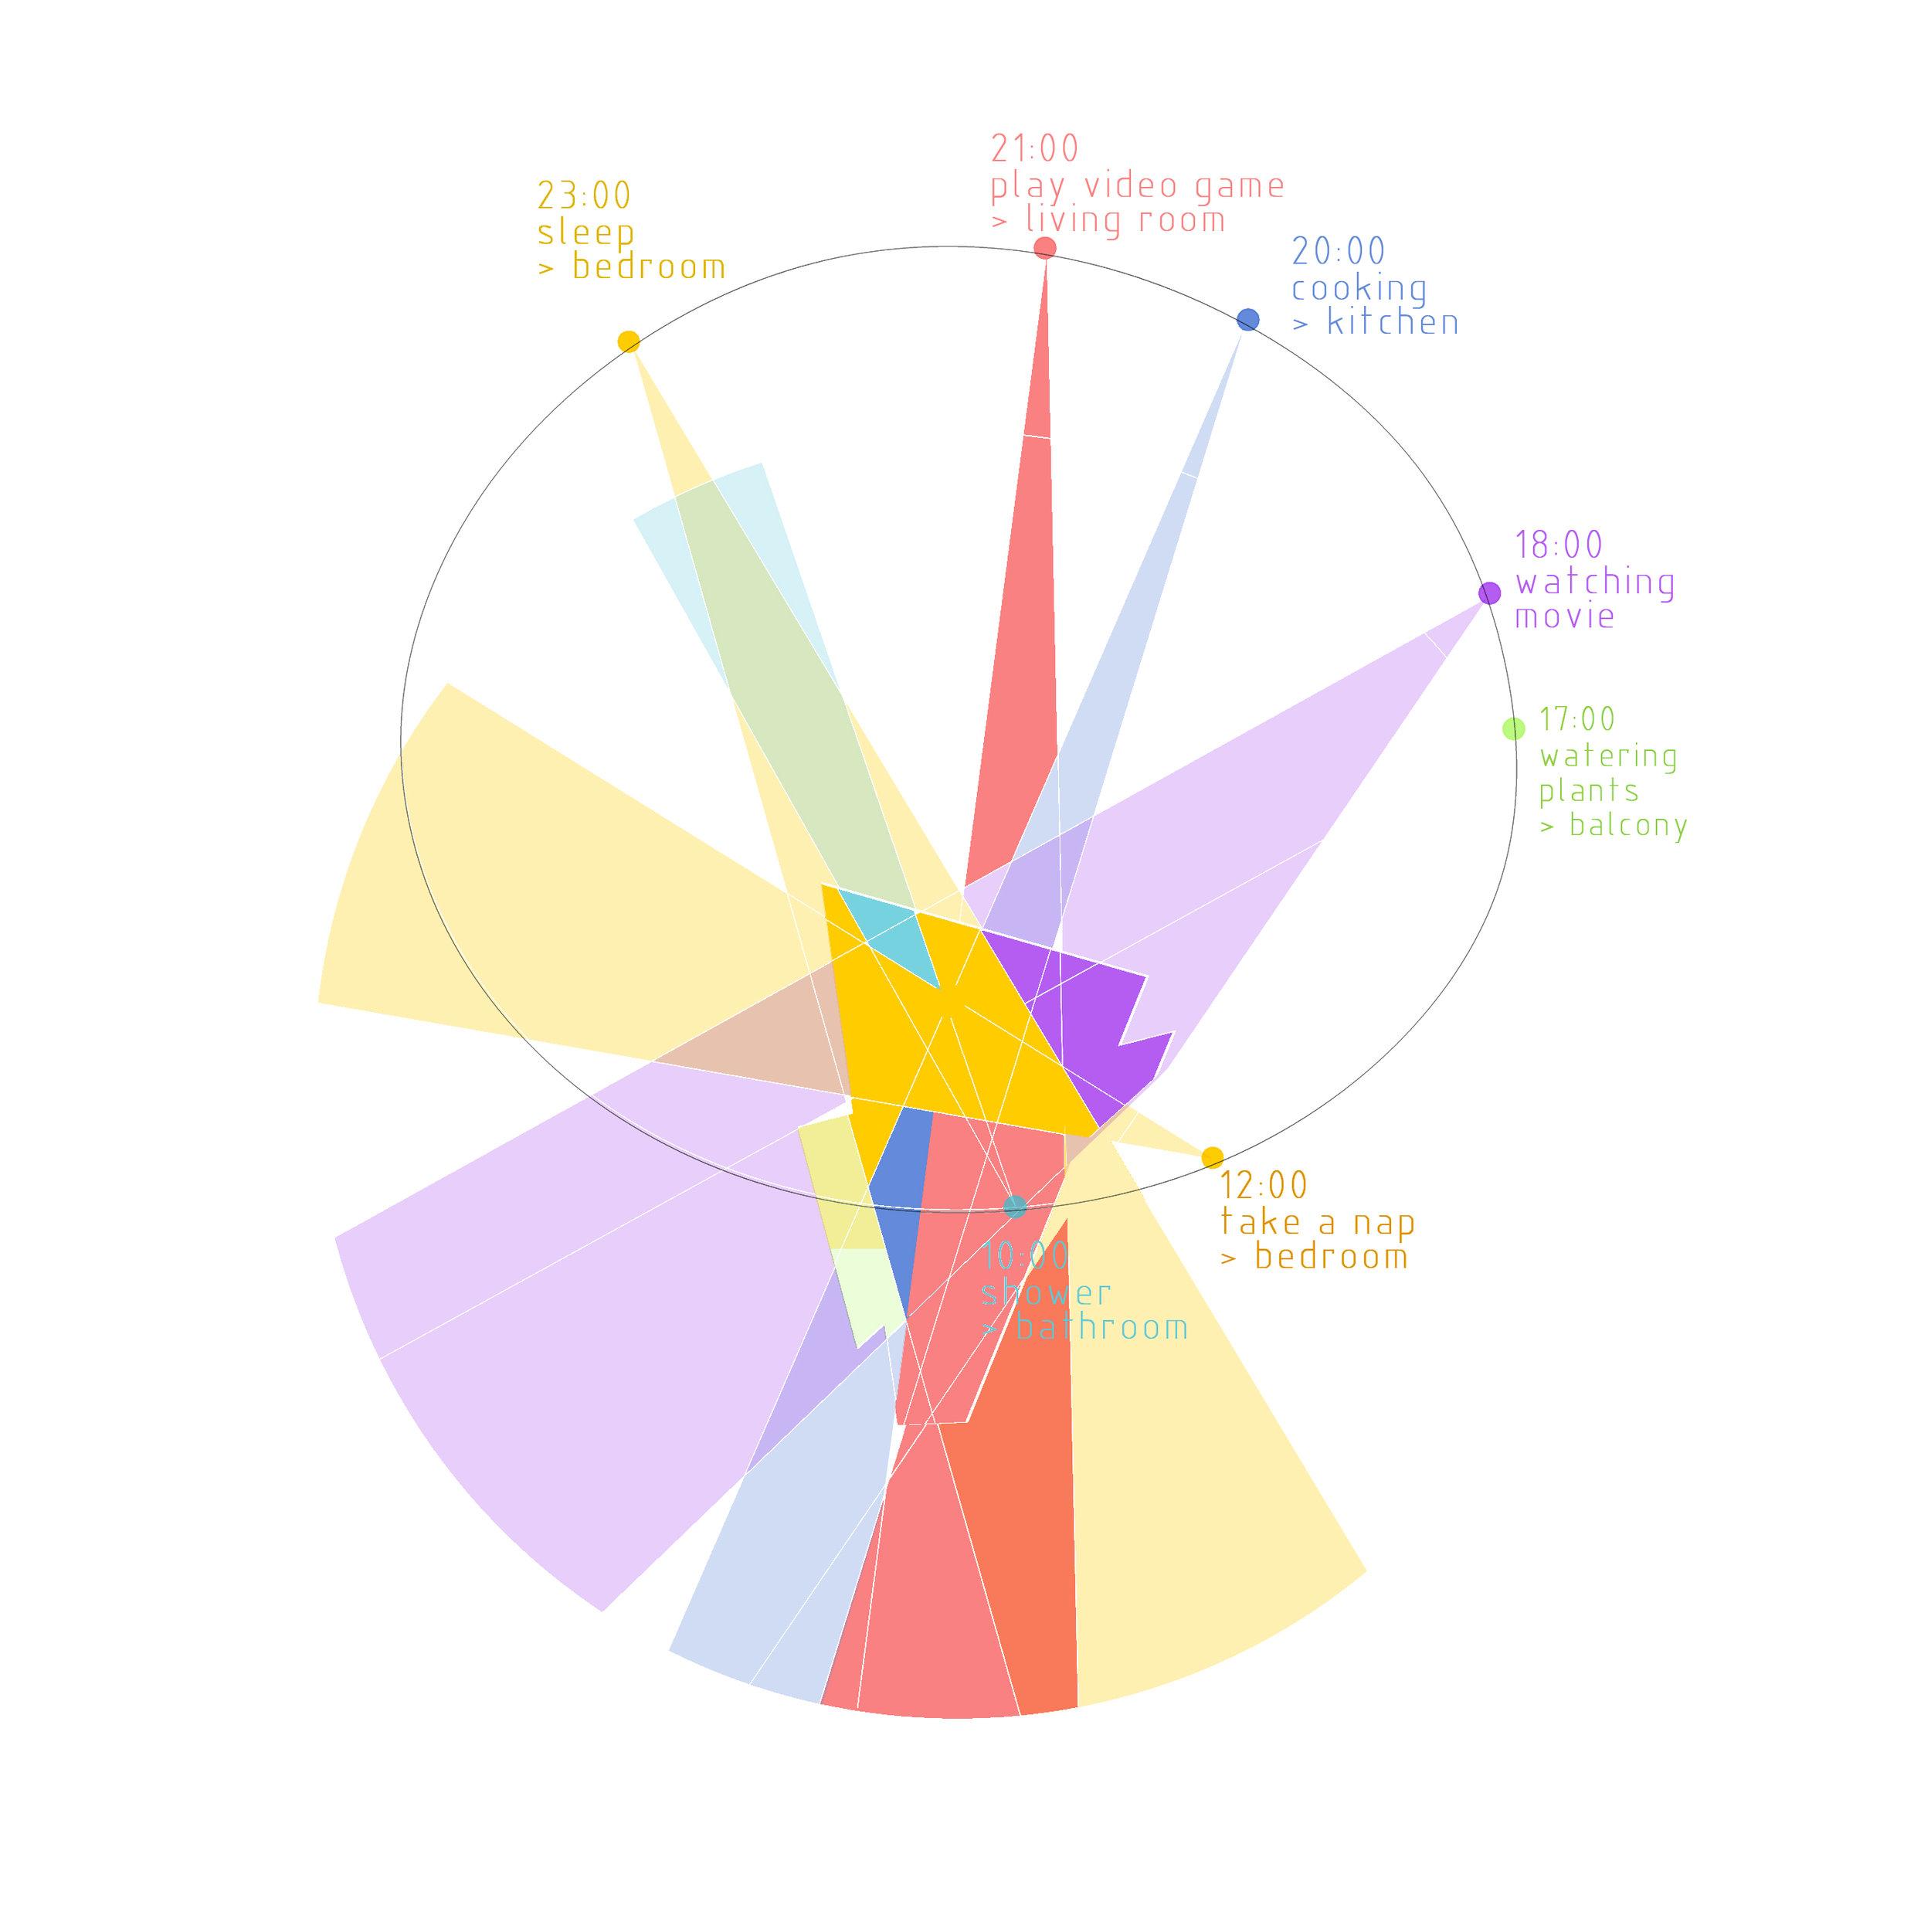 SparanoMooneyArchitecture_PulsarHouse_Diagram1.jpg